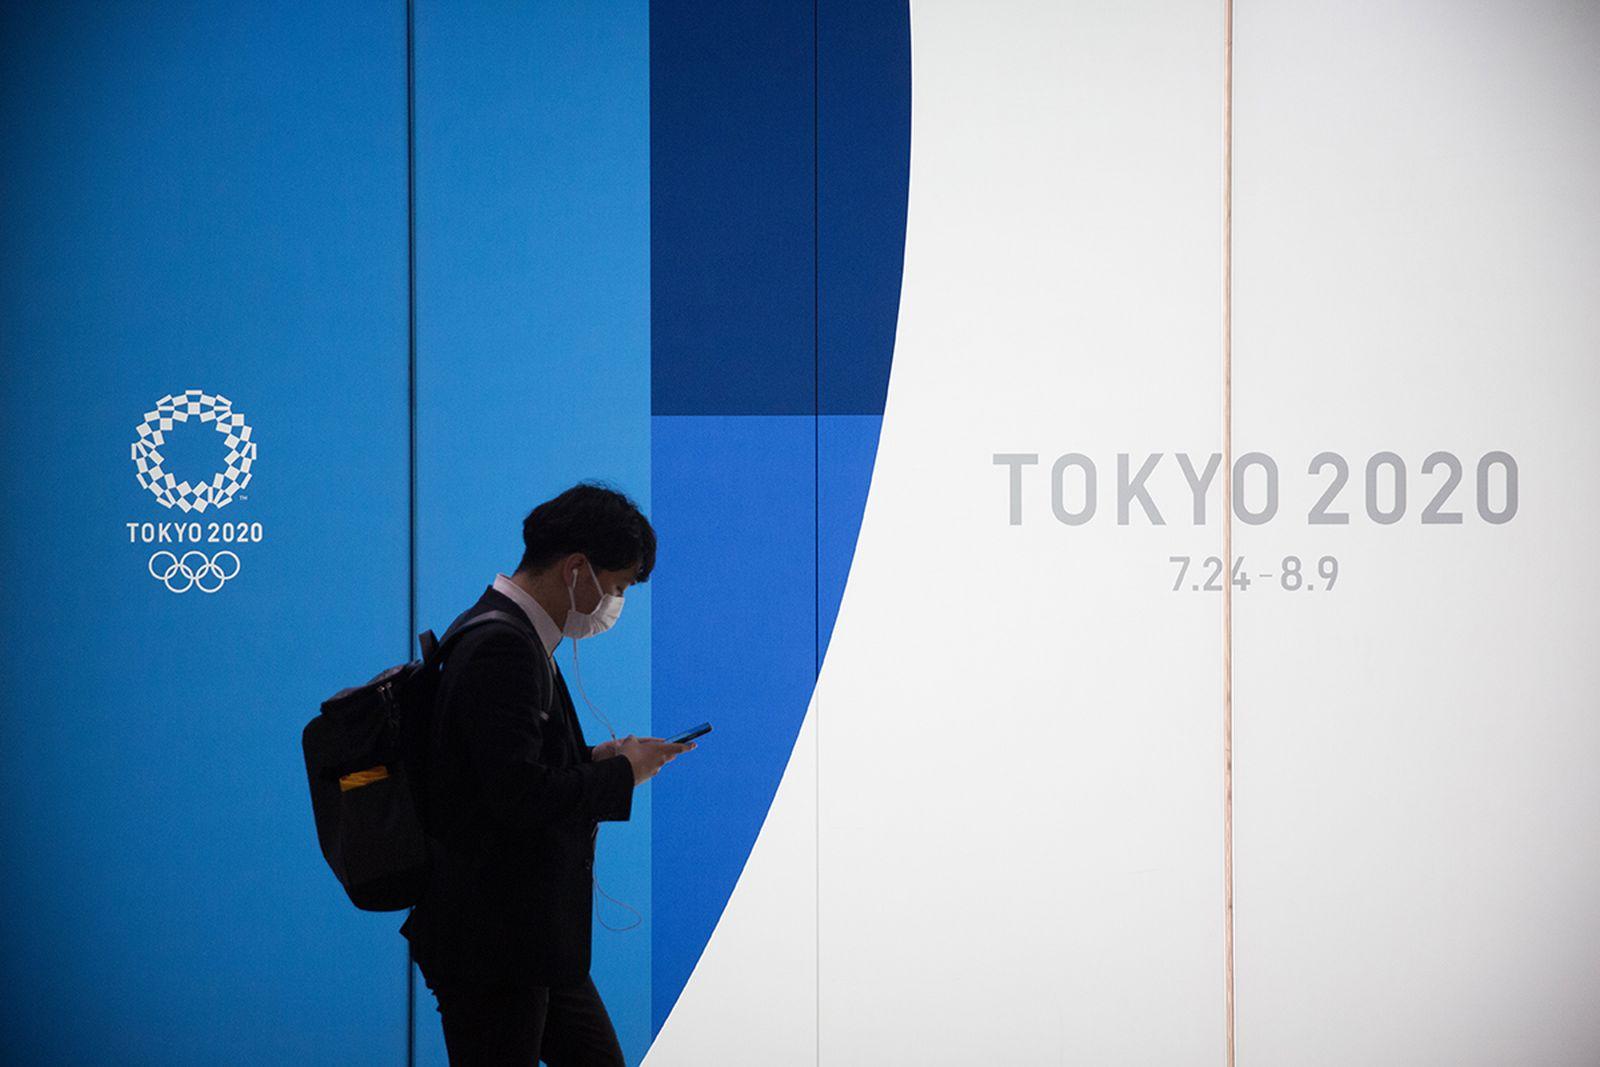 Man wearing face mask walks past billboard for Tokyo olympics